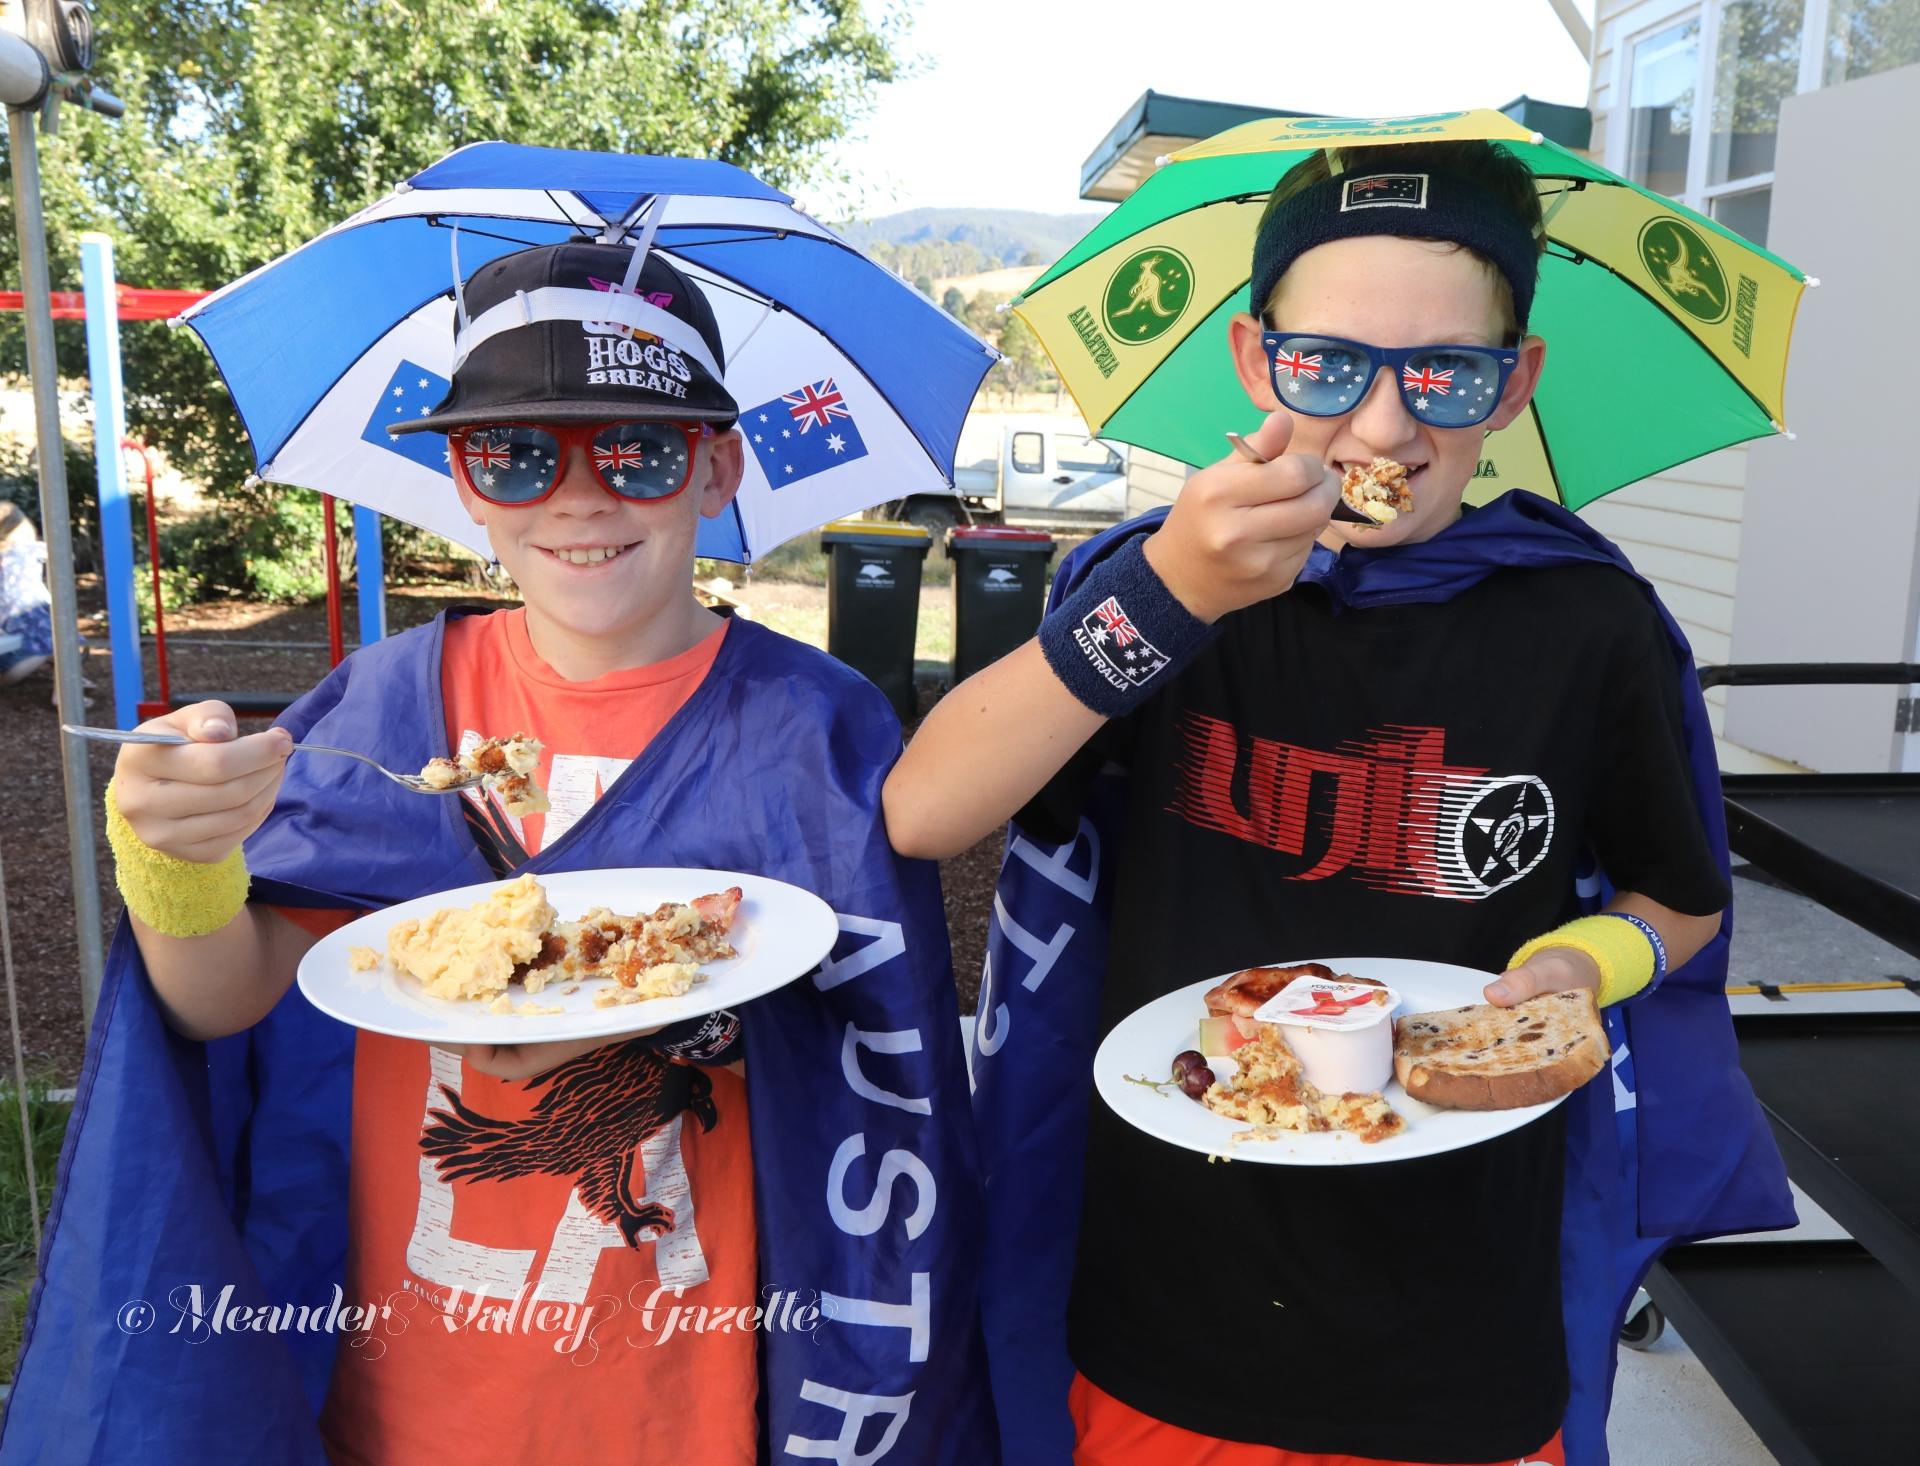 Australia Day breakfast Chudleigh 2019 image 1